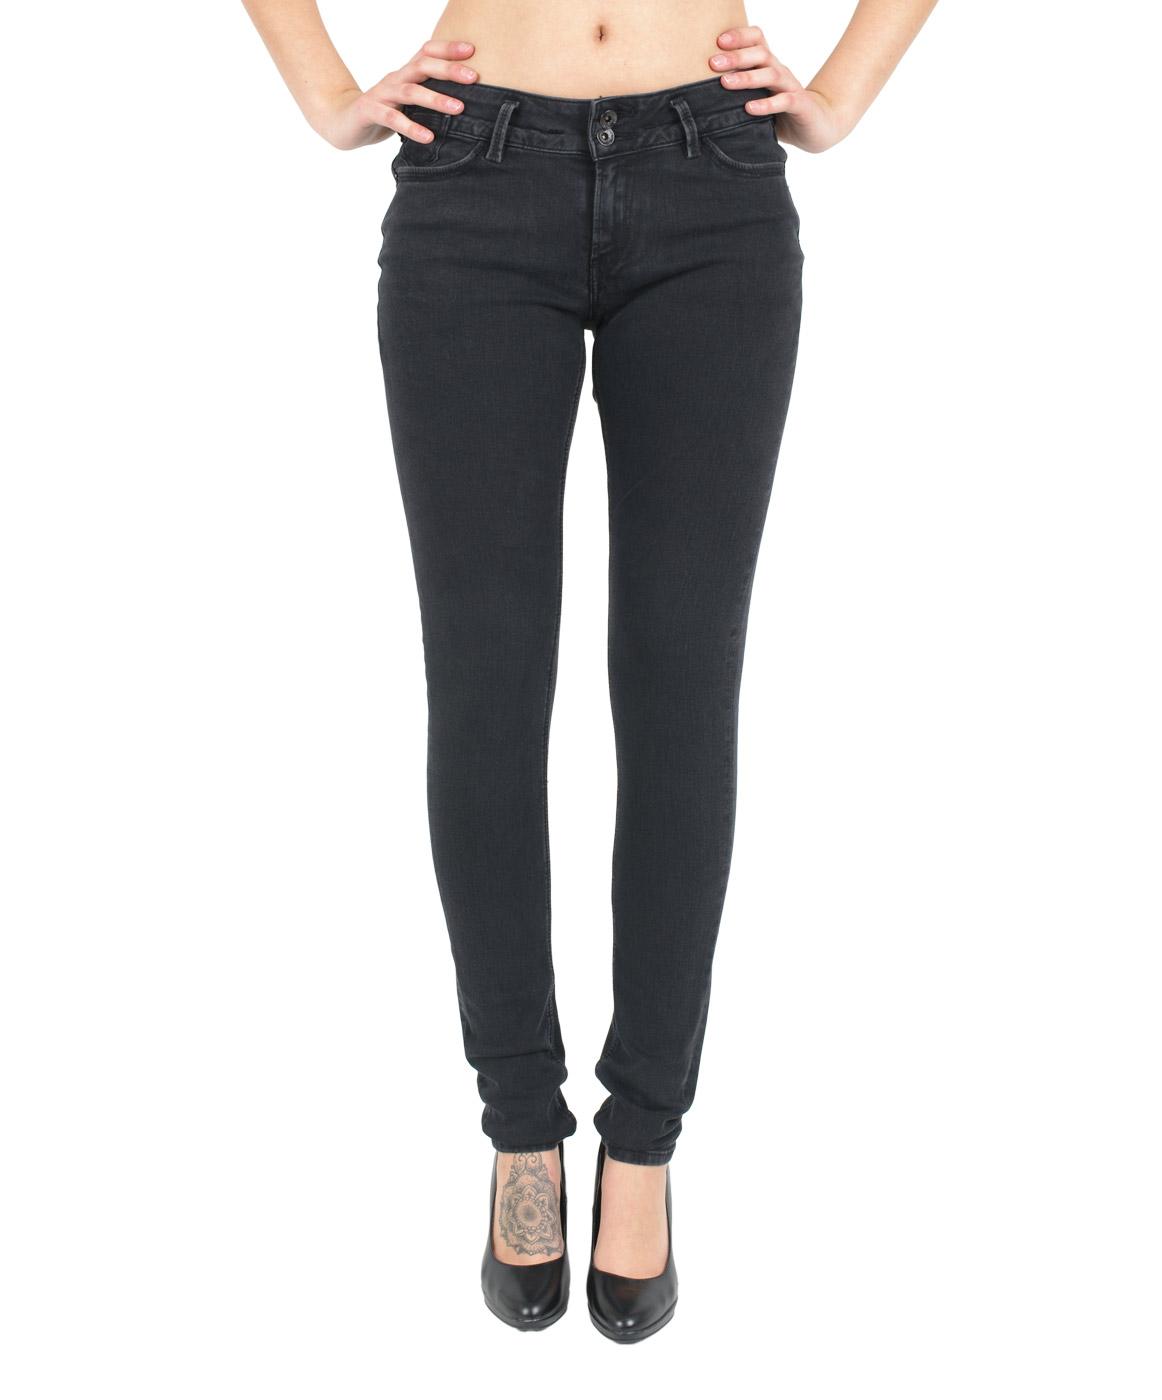 Hosen - Garcia Jeans Röhre Rachelle in Black Worn  - Onlineshop Jeans Meile